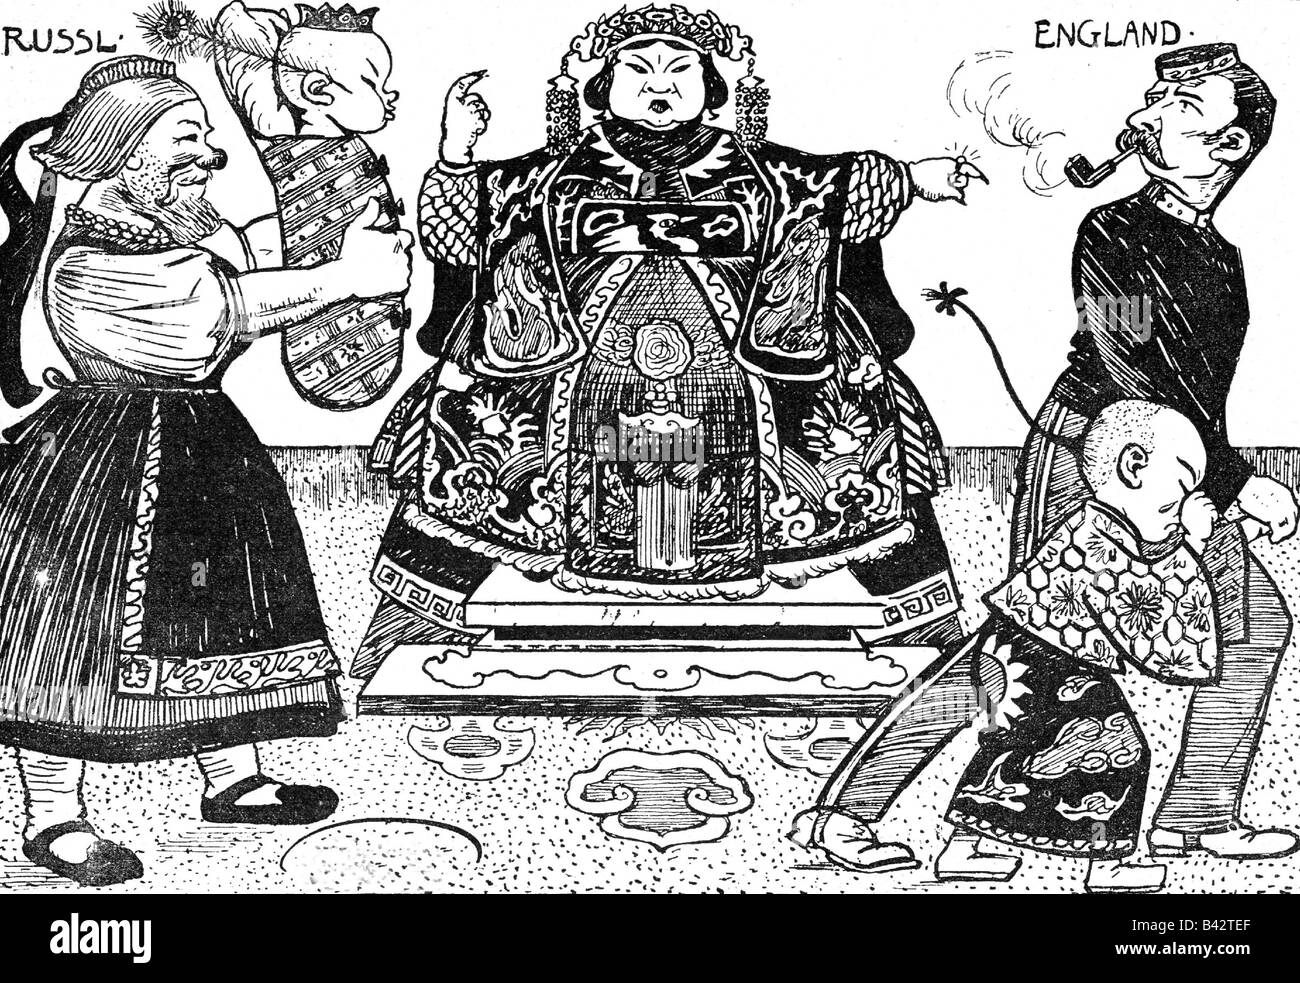 Cixi, 29.11.1835 - 15.11.1908, Empress Dowager of China 22.8.1861 - 15.11.1908, deposing Emperor Guangxu, 1898, - Stock Image